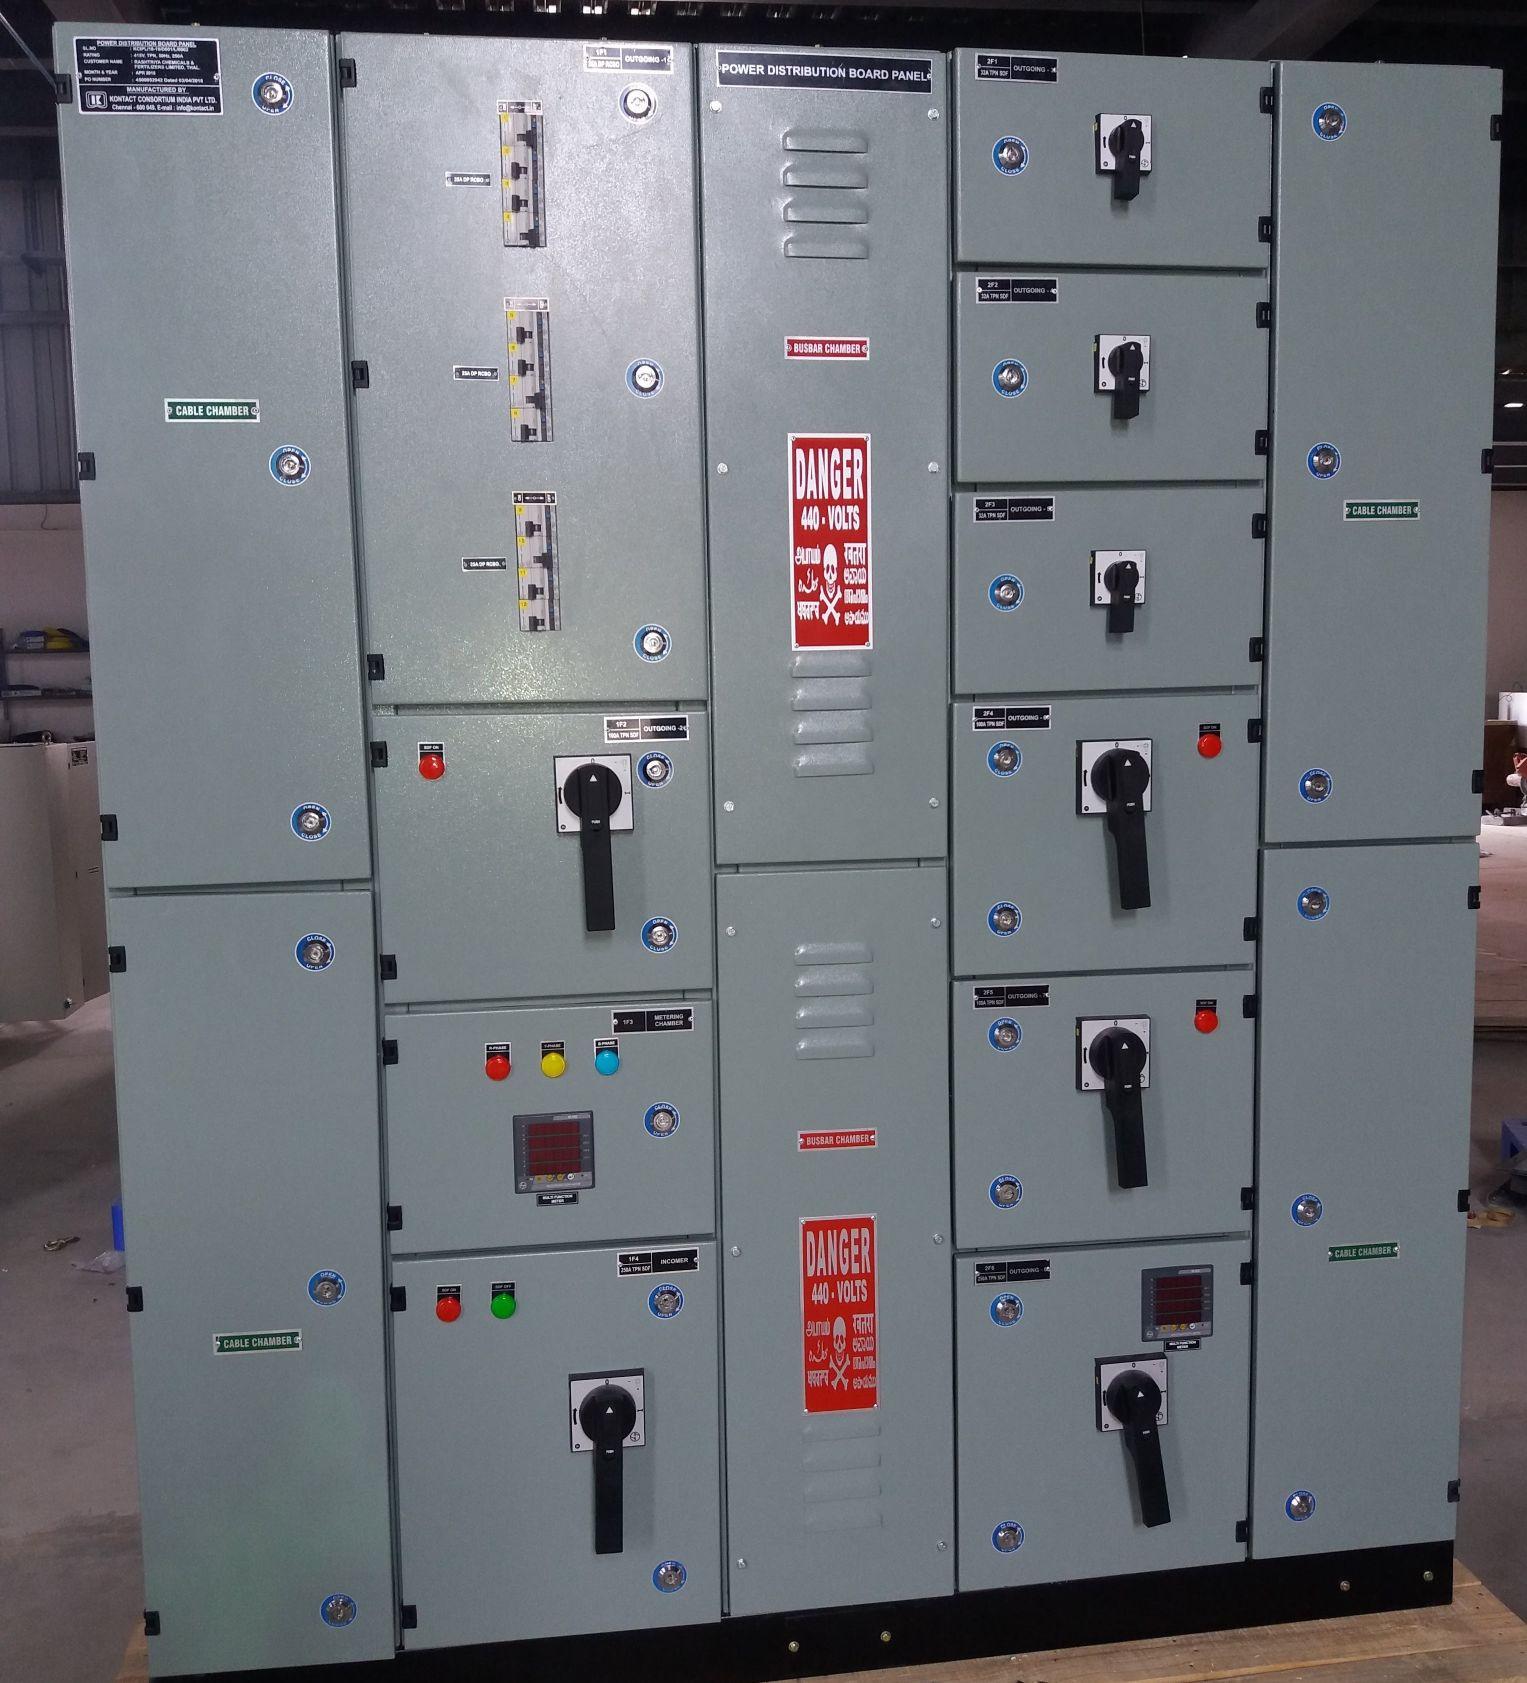 Power Distribution Board (PDB)